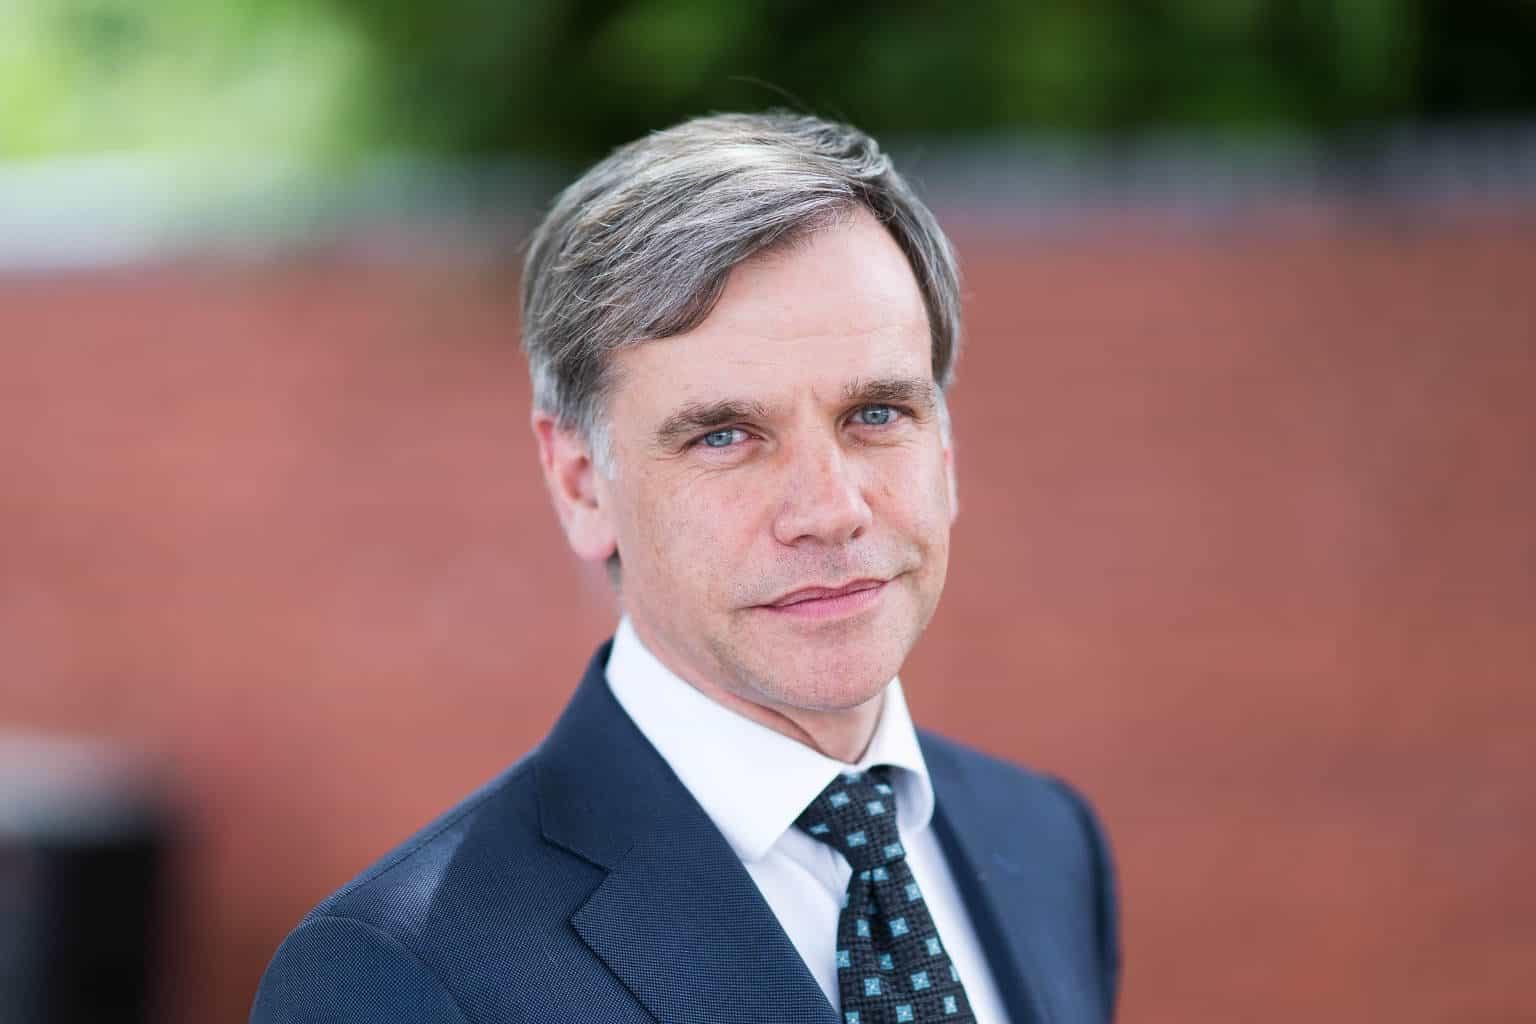 British Business Bank CEO Keith Morgan